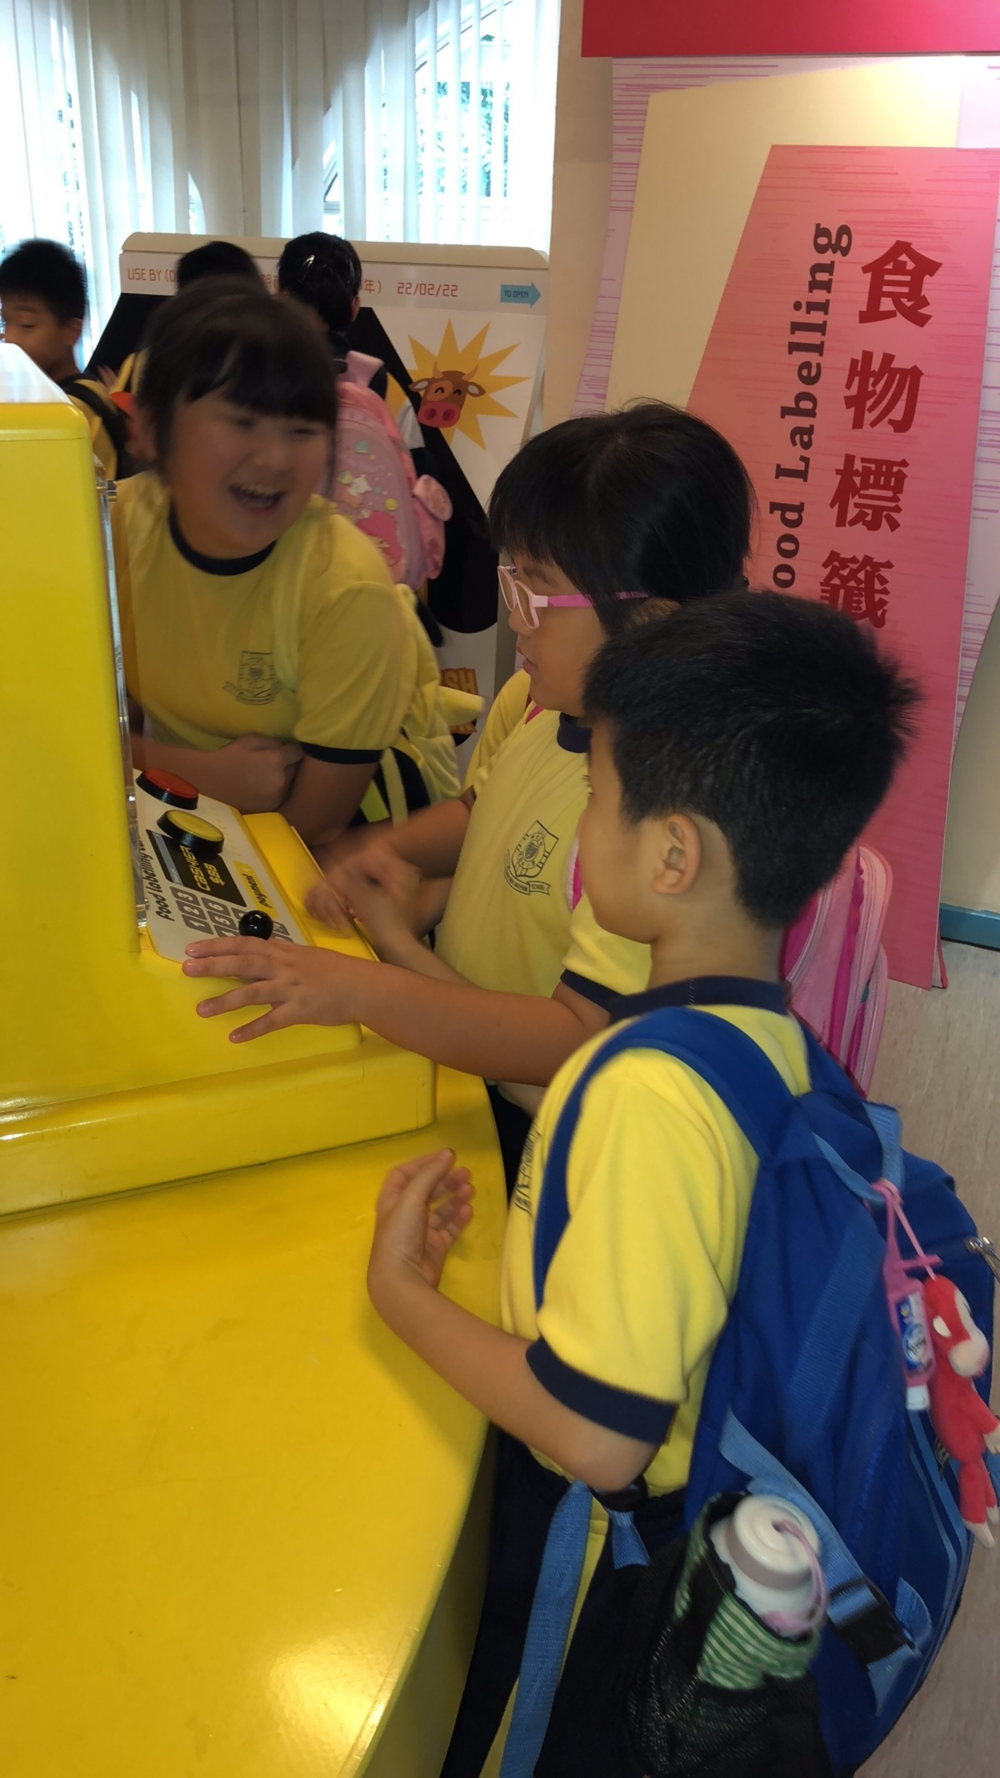 http://pohckwps.edu.hk/sites/default/files/03_16.jpg